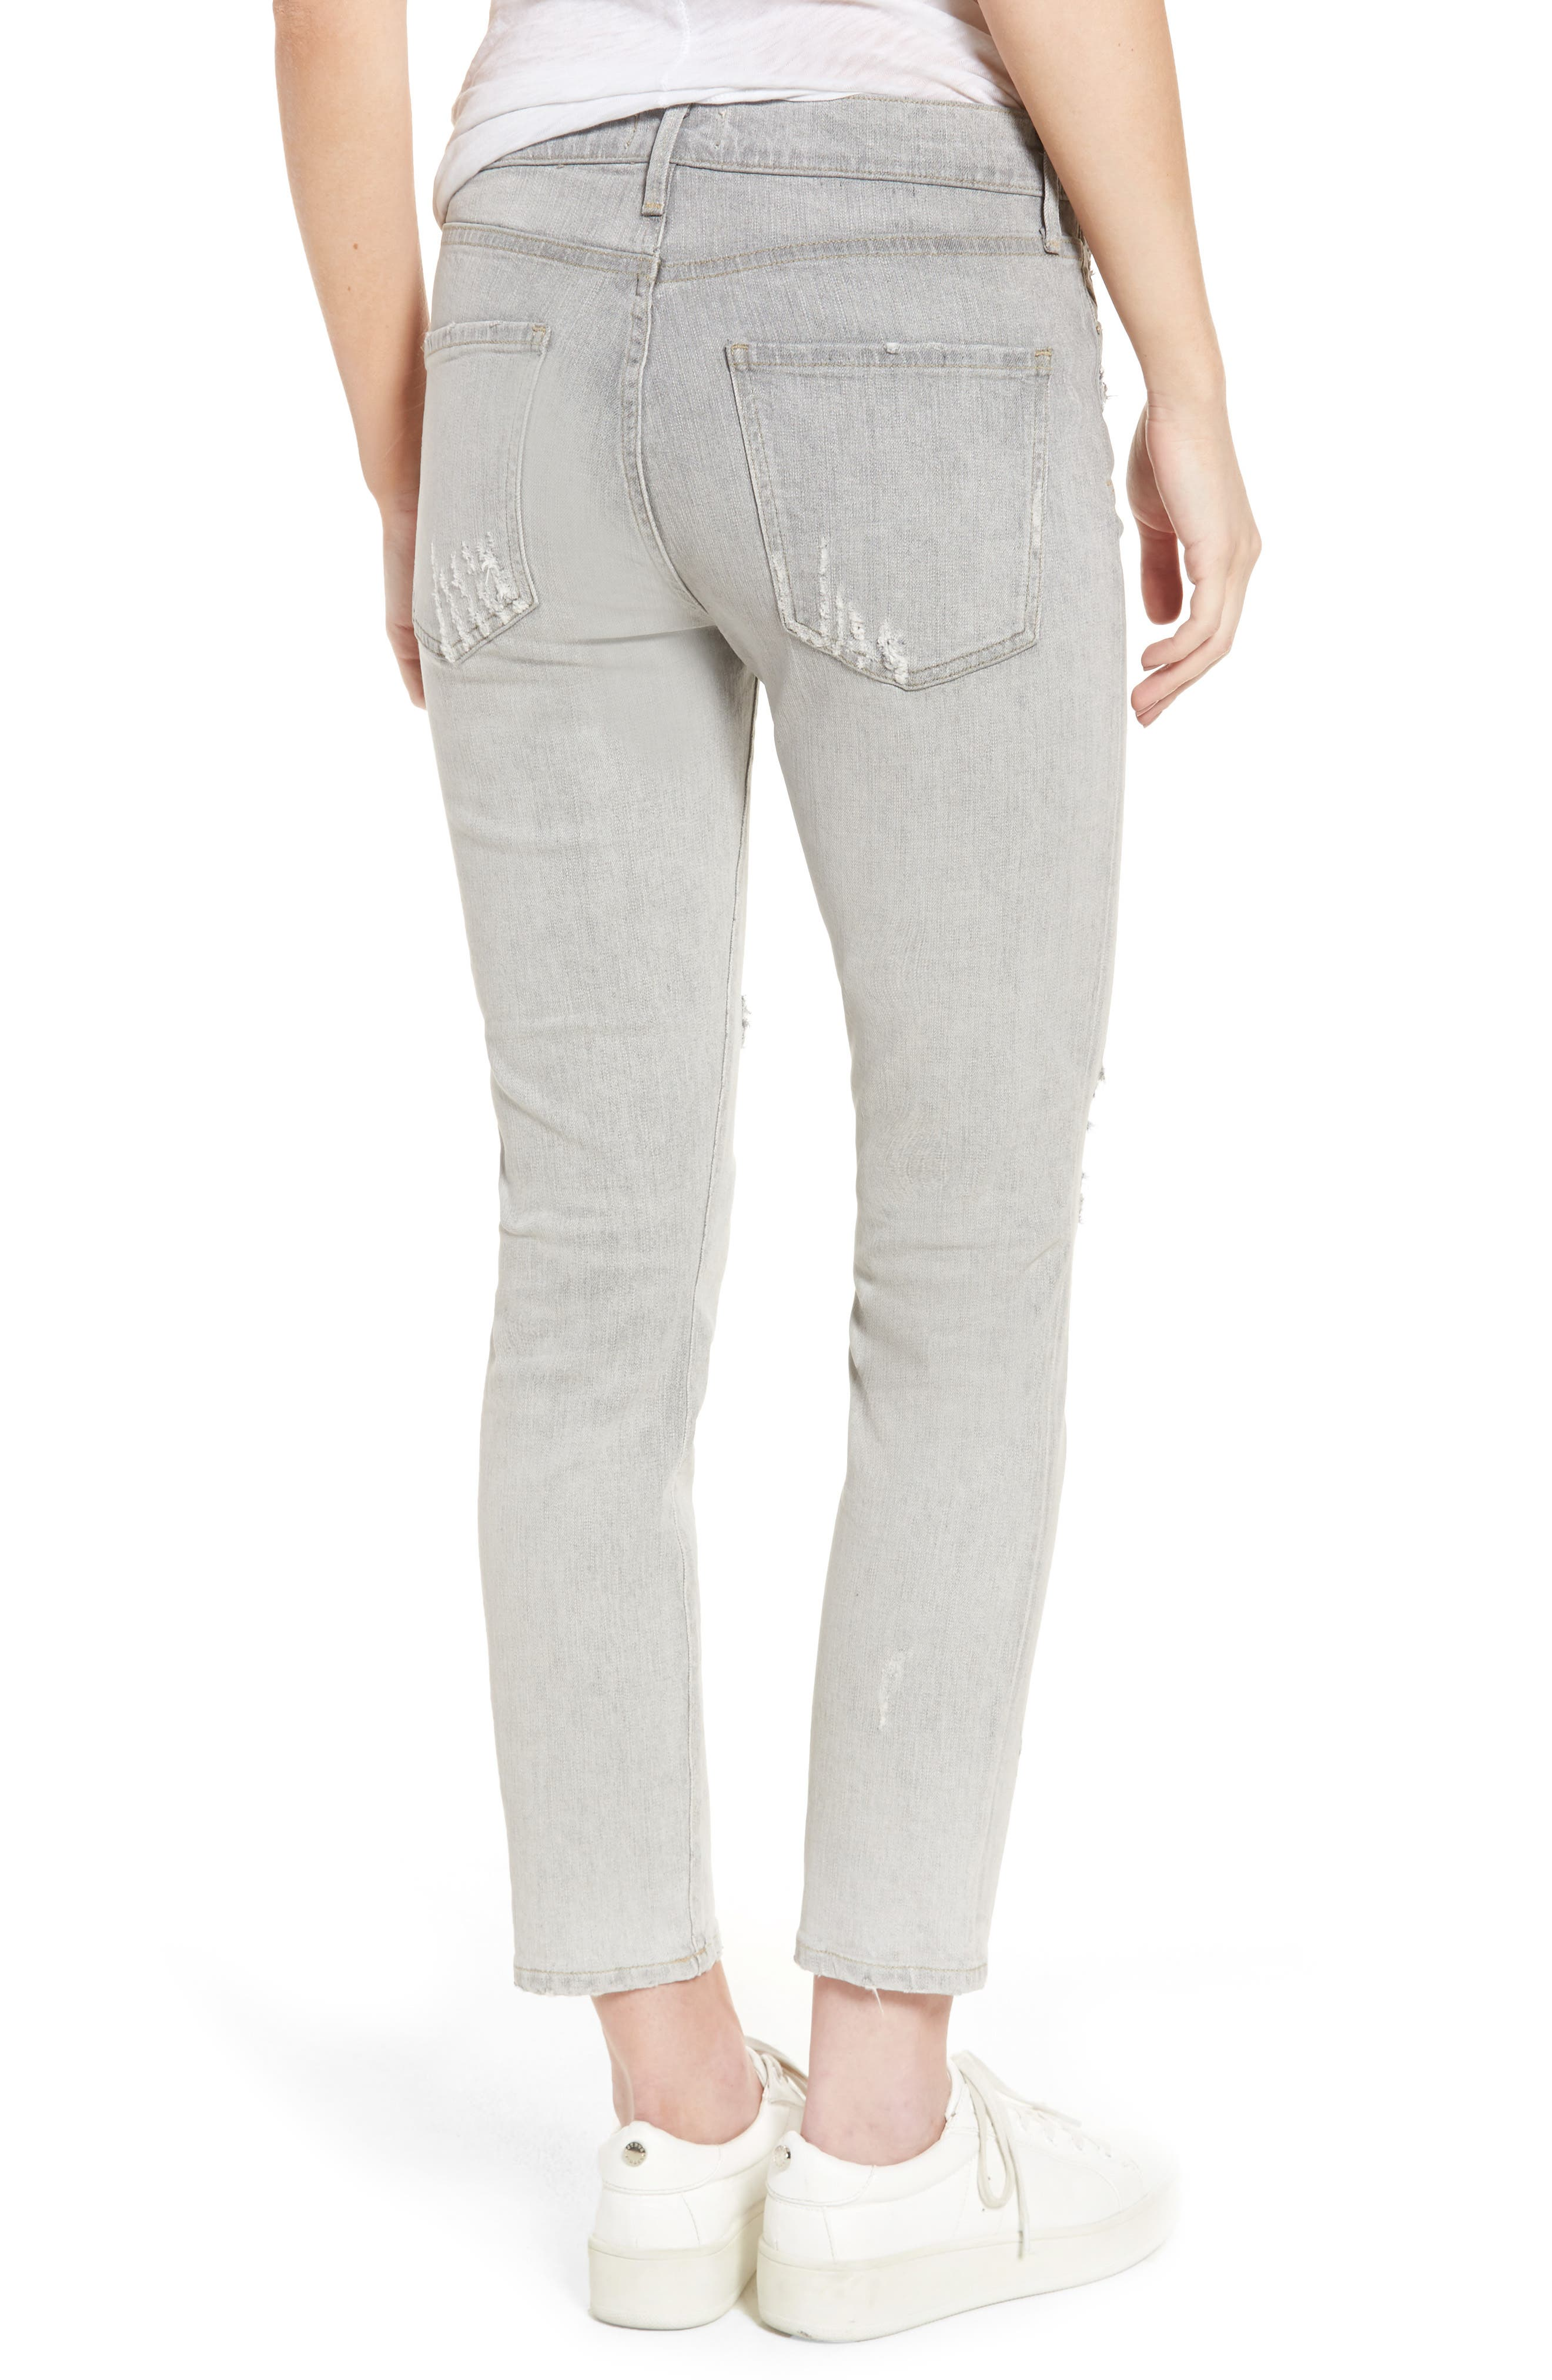 Sophie High Waist Skinny Jeans,                             Alternate thumbnail 2, color,                             Portland Destruct